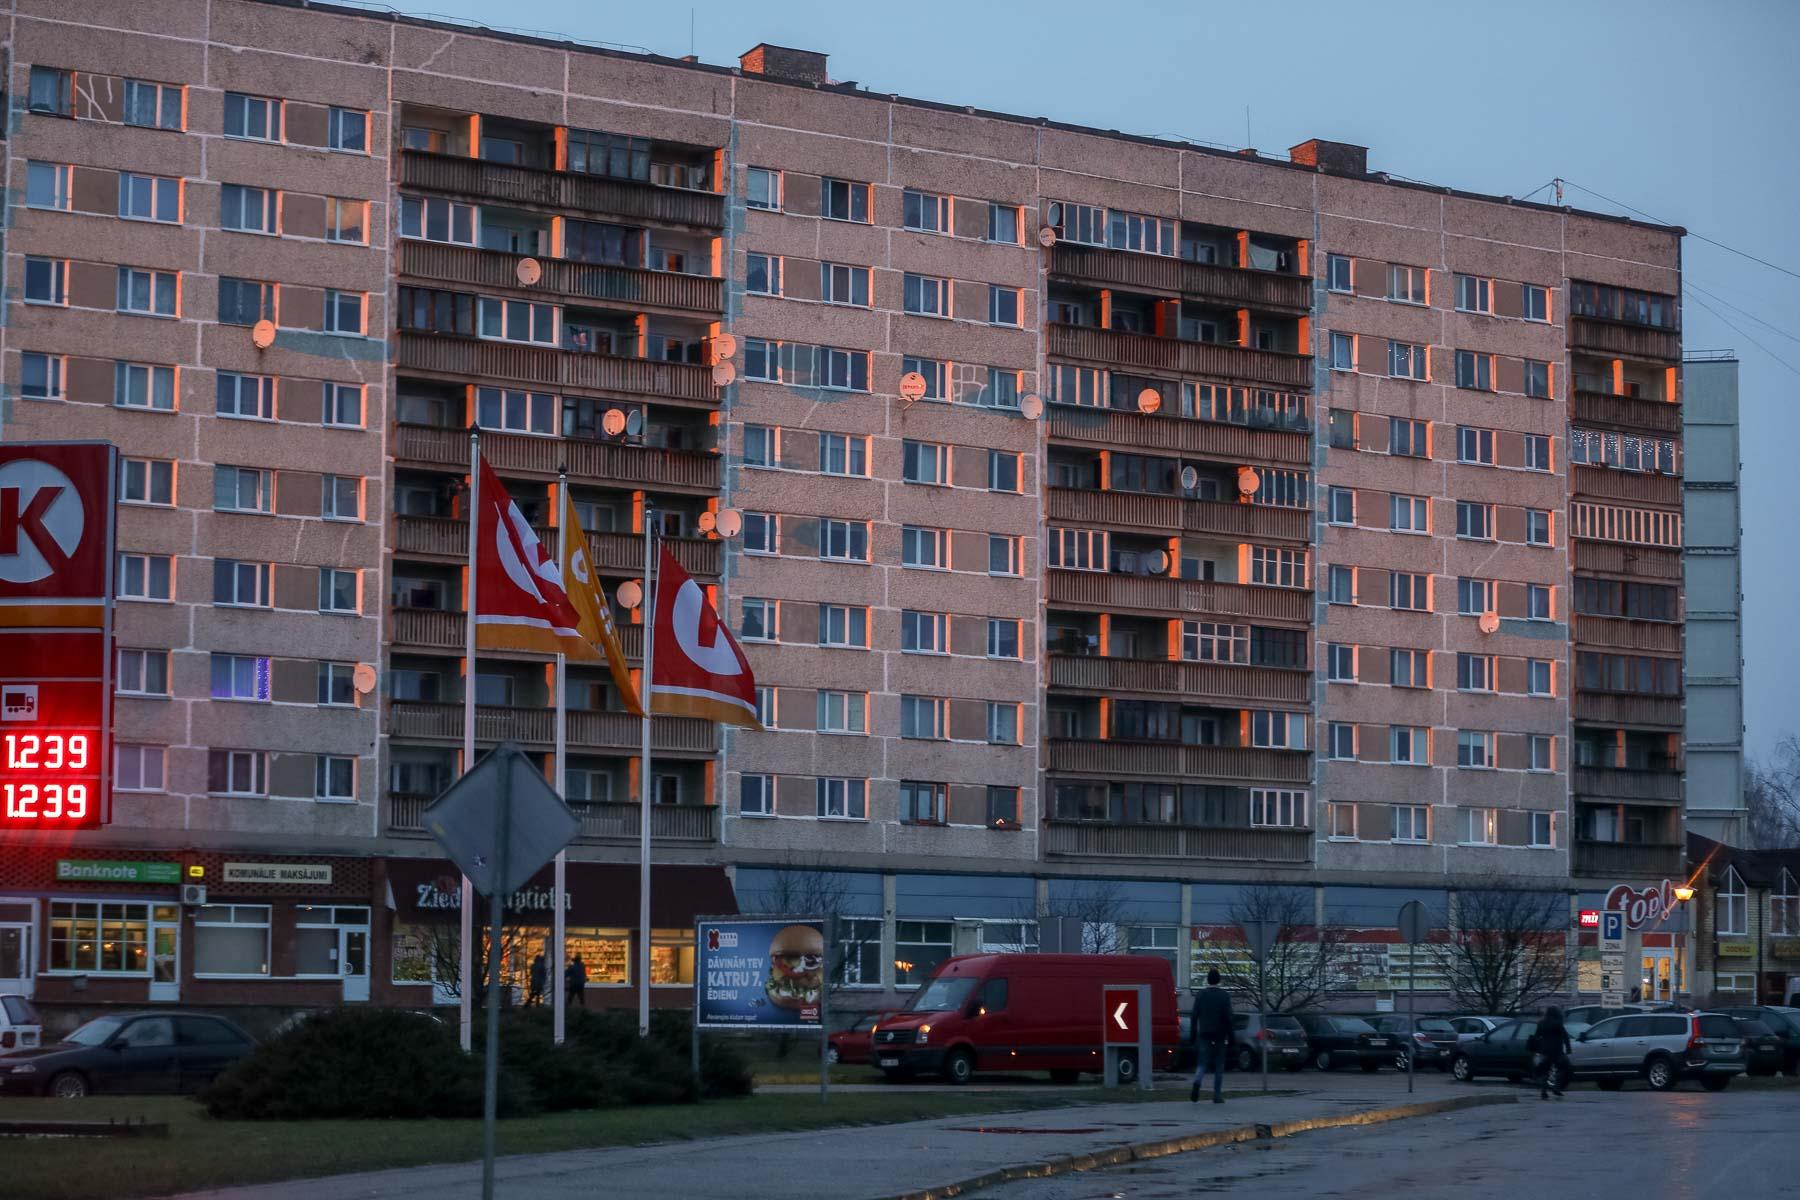 Landscape-cityscape-photography-jelgava-latvia-blocs-blocks-flat-post-soviet--Советские-квартиры-спальный-район-Латвия-город-фотограф-natalia-smith-photography-0079.jpg